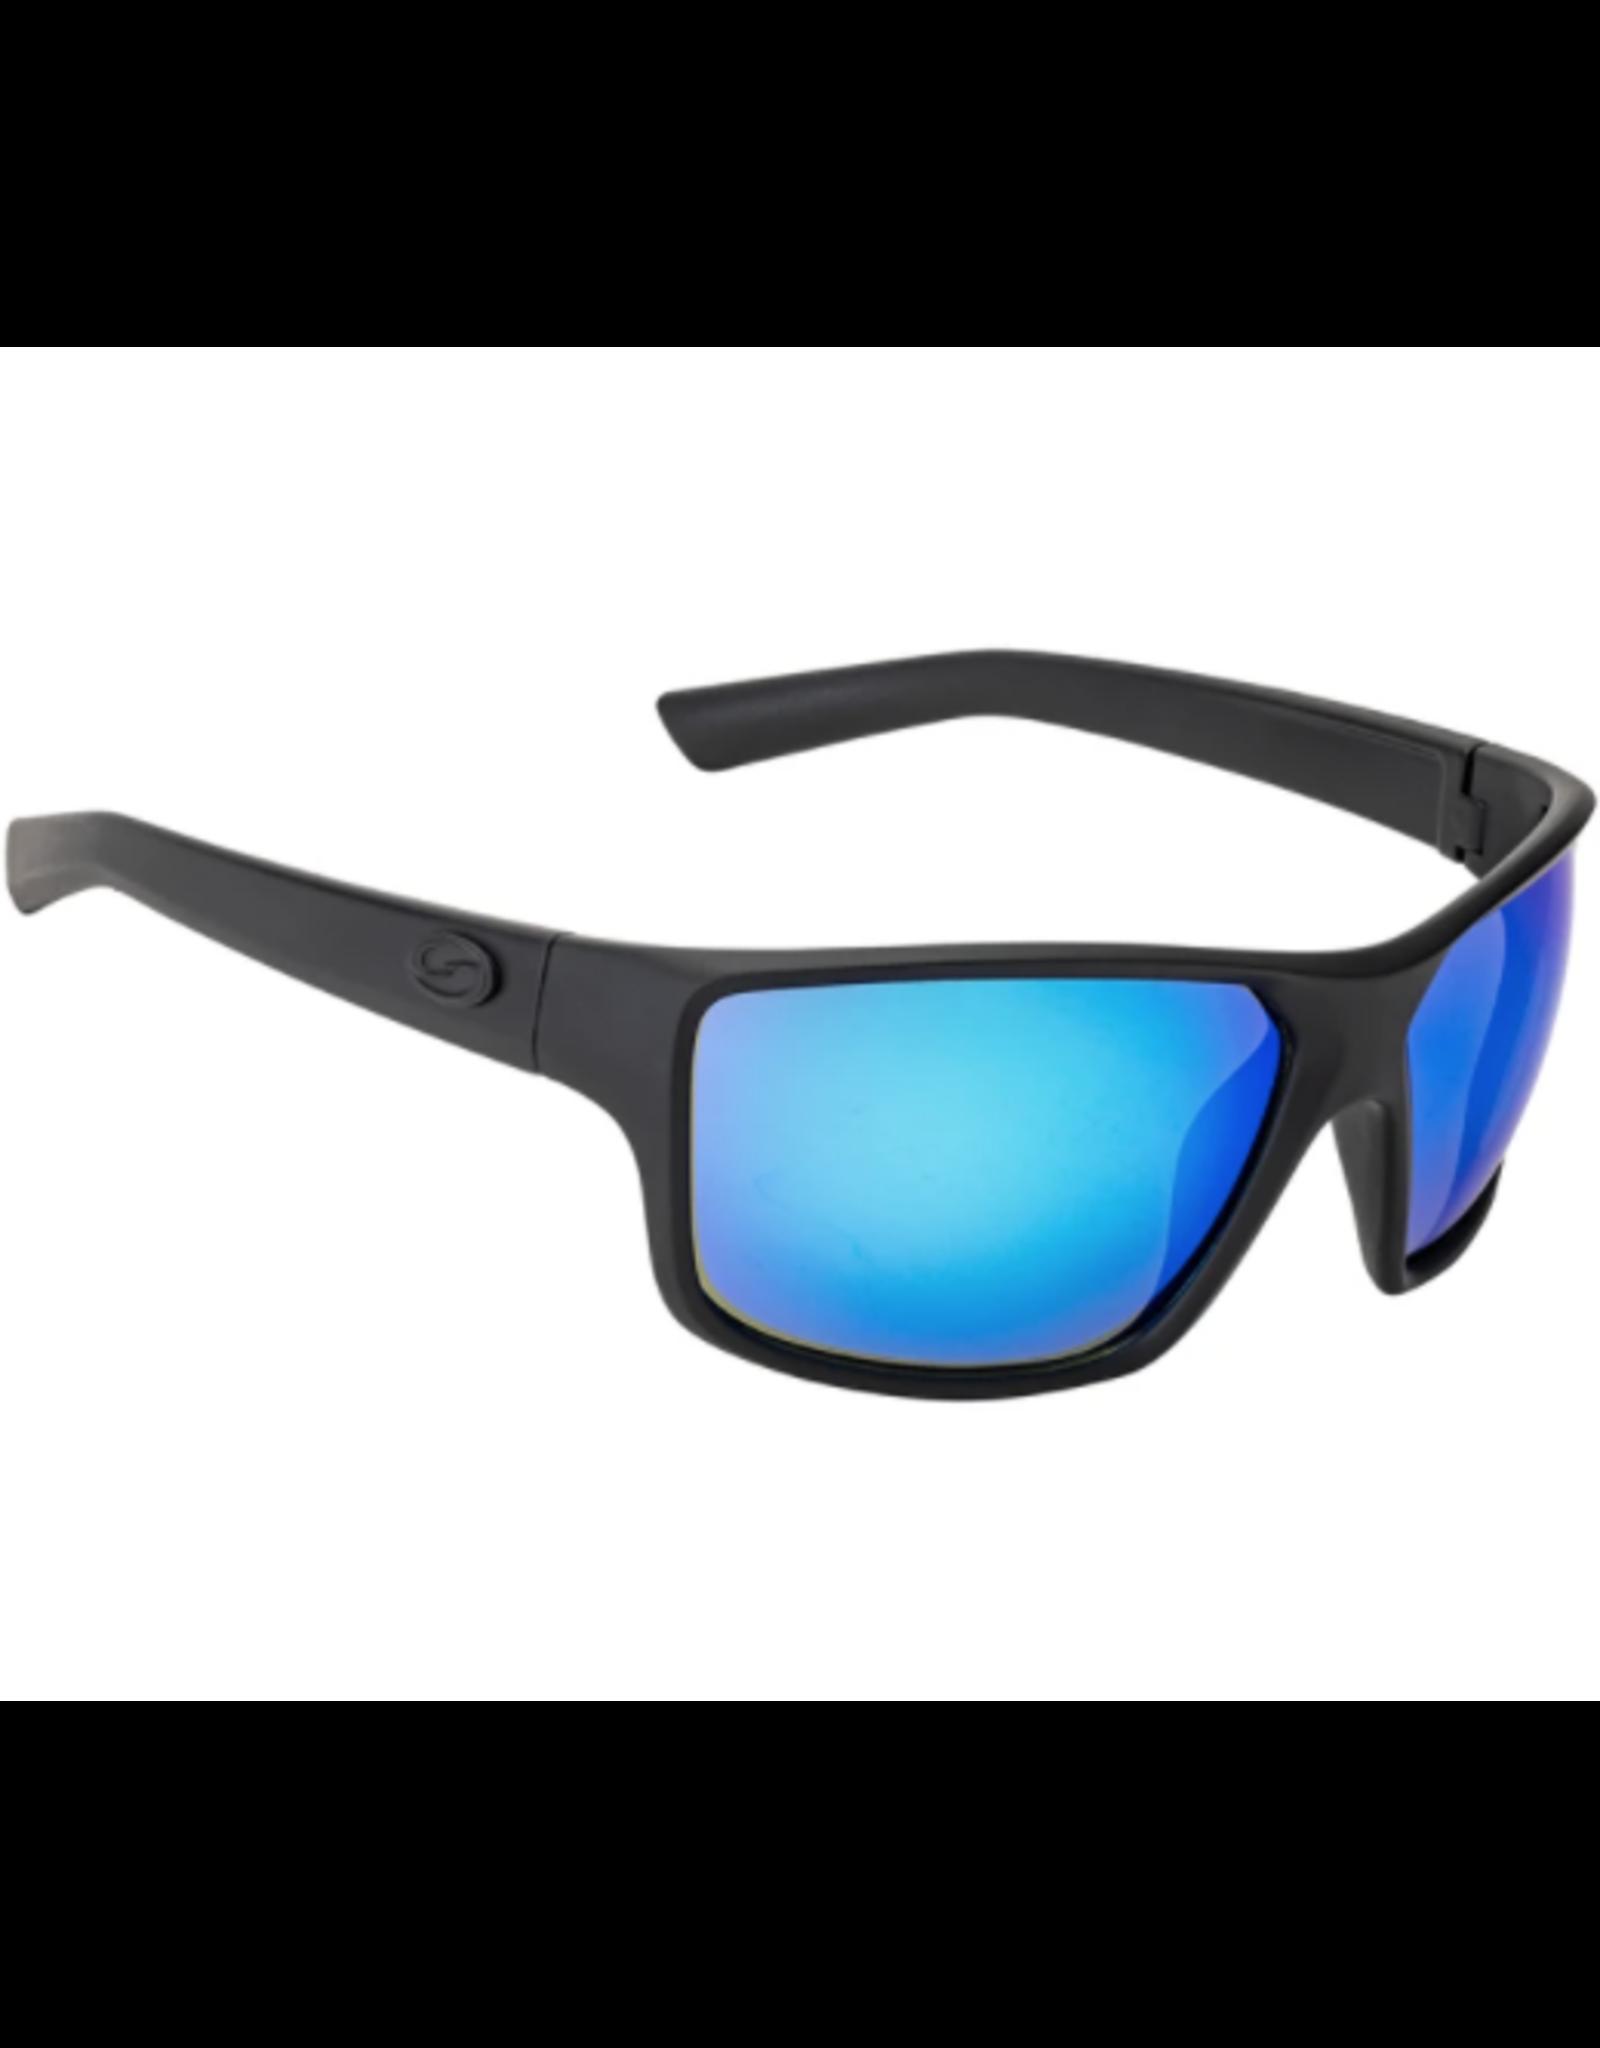 Strike King Strike King S11 Optics Clinch Sunglasses